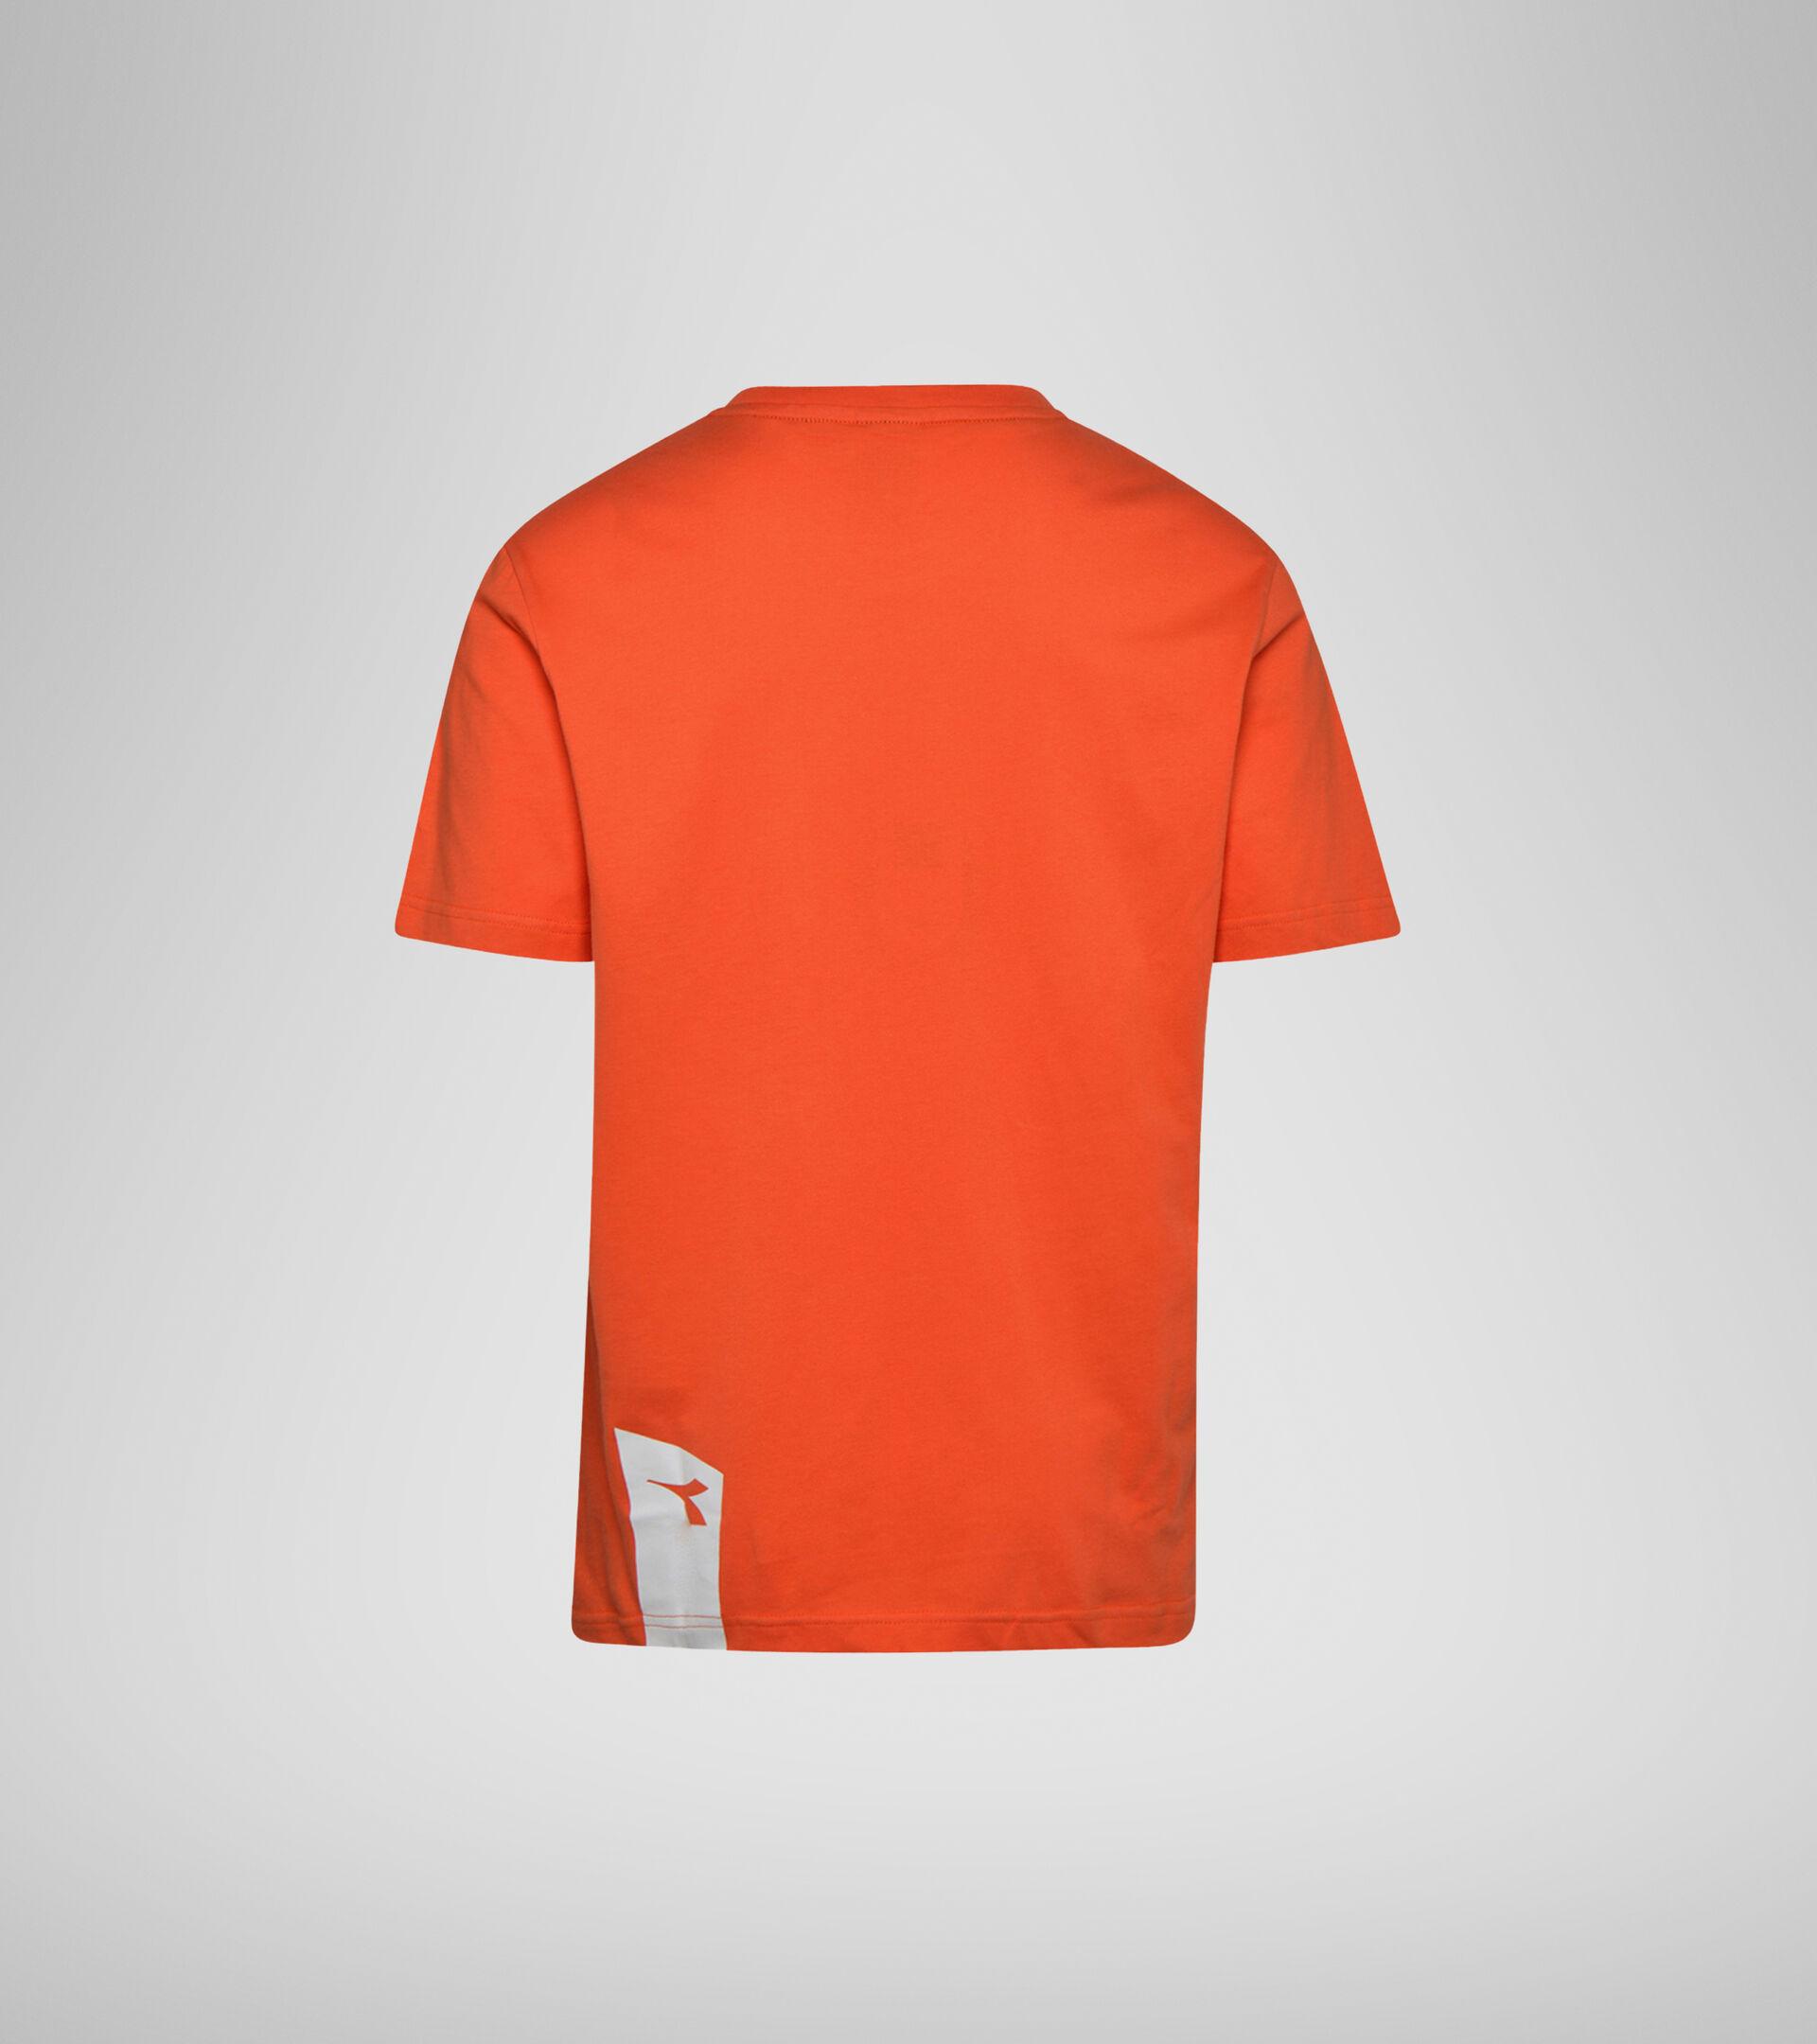 Apparel Sportswear UOMO T-SHIRT SS ICON ARANCIATA Diadora